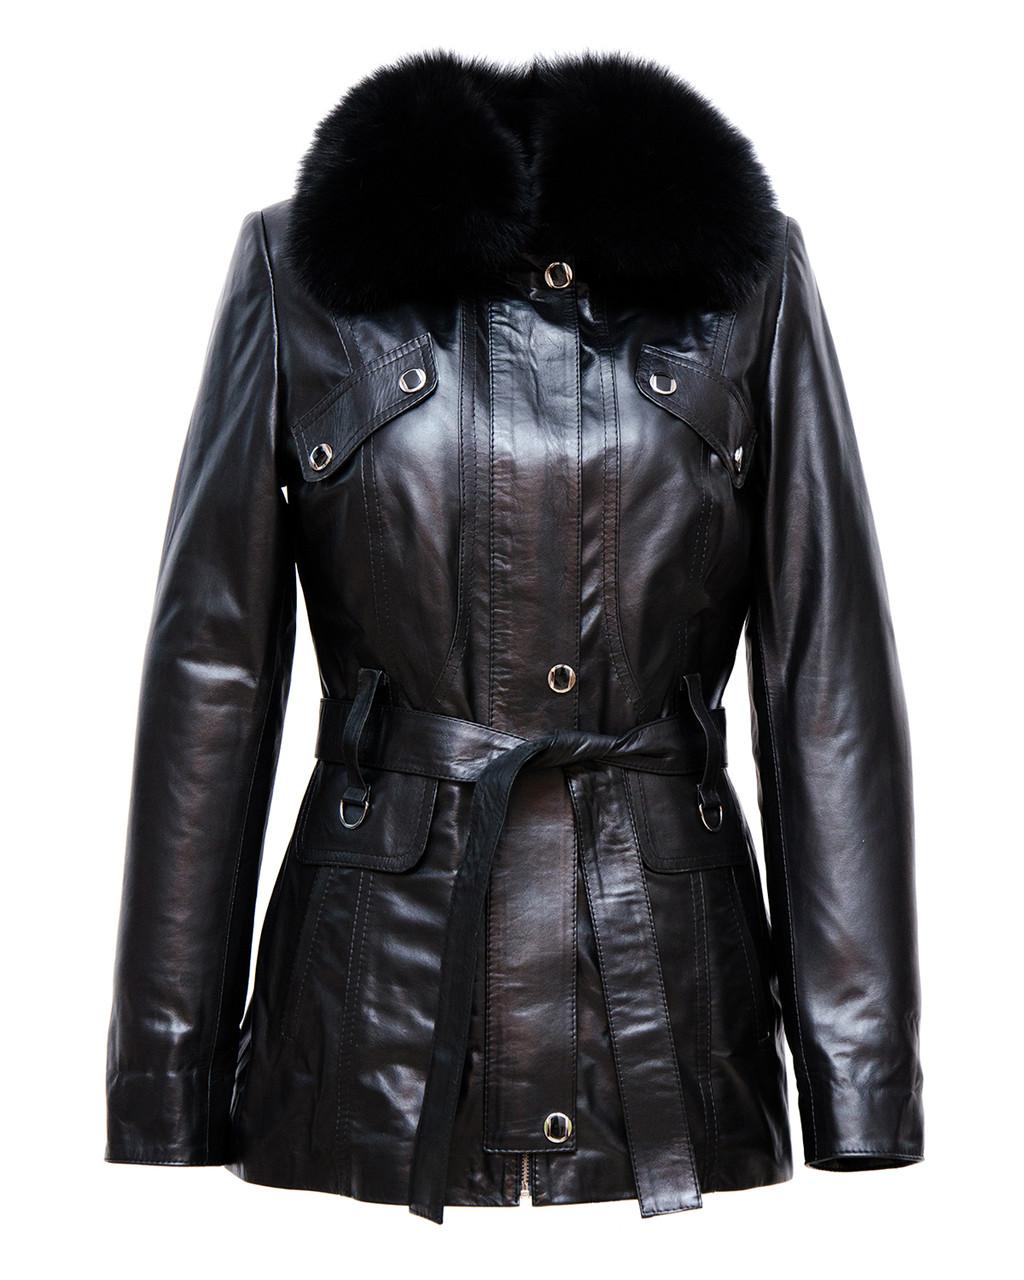 Шкіряна куртка VK чорна трансформер довга (Арт. E202)